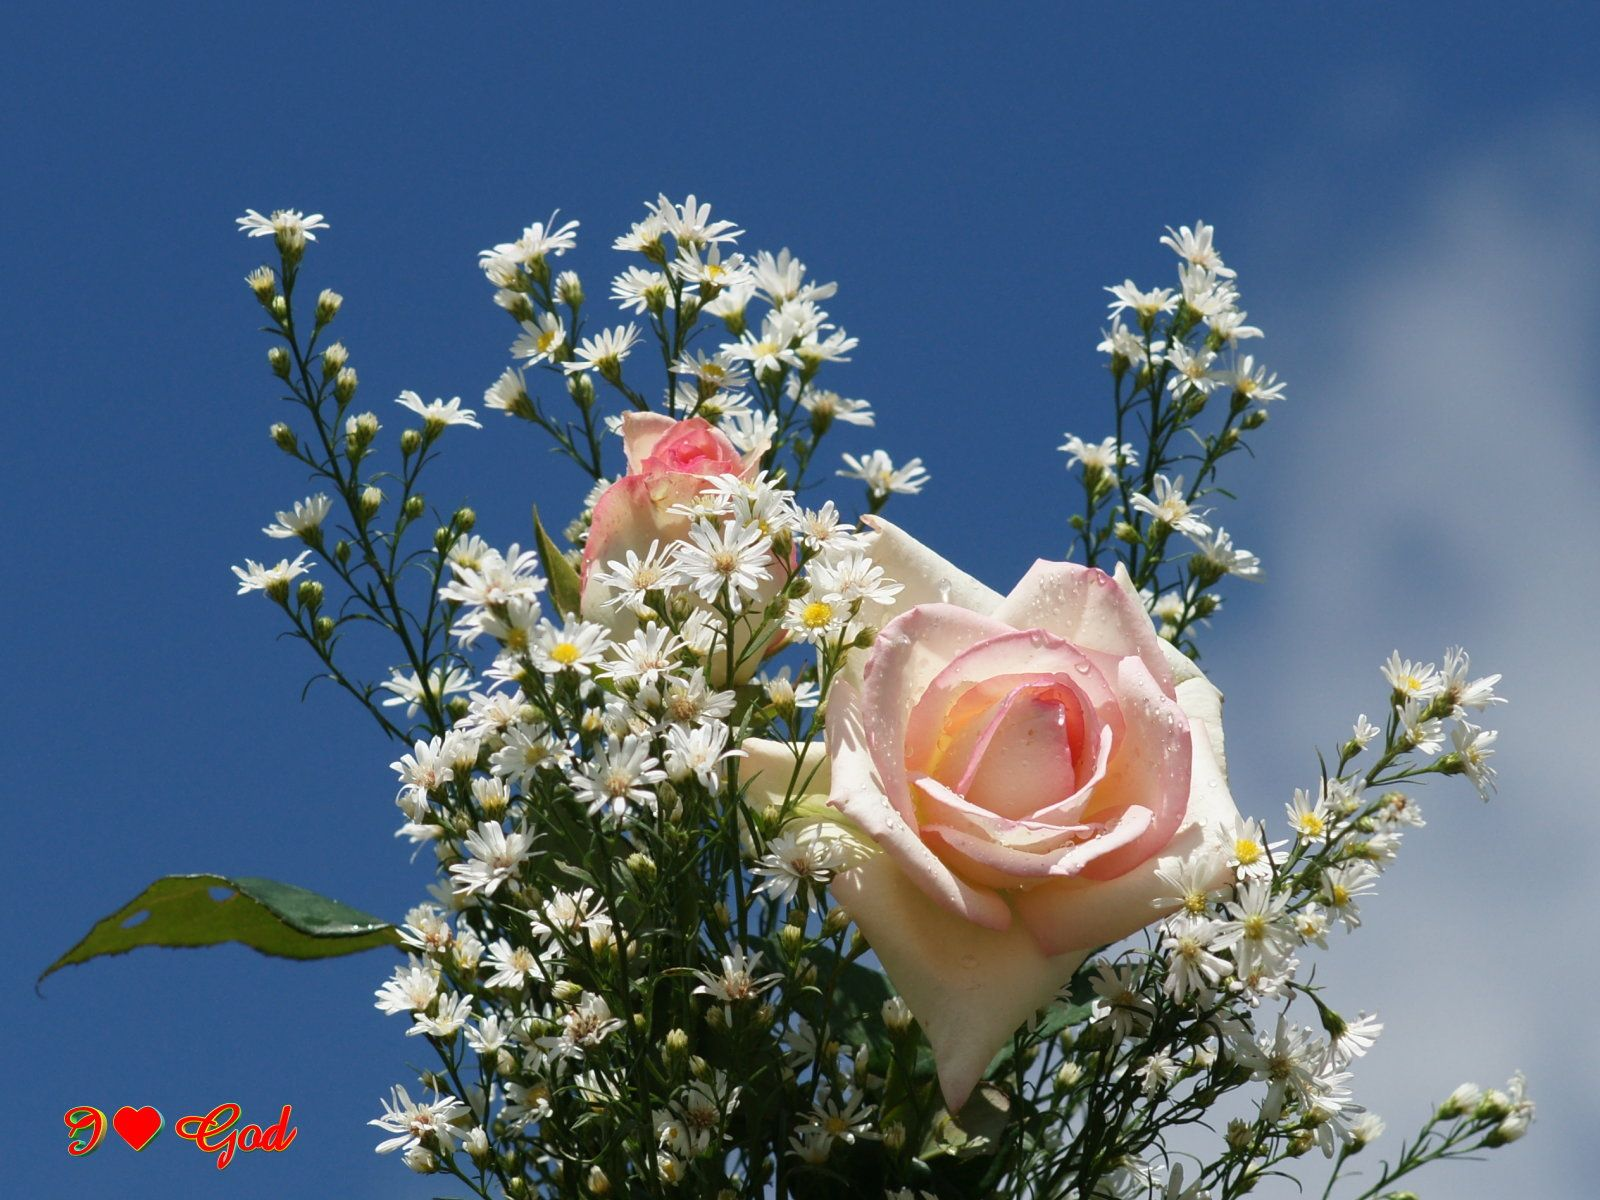 roses wallpaper..says i love God